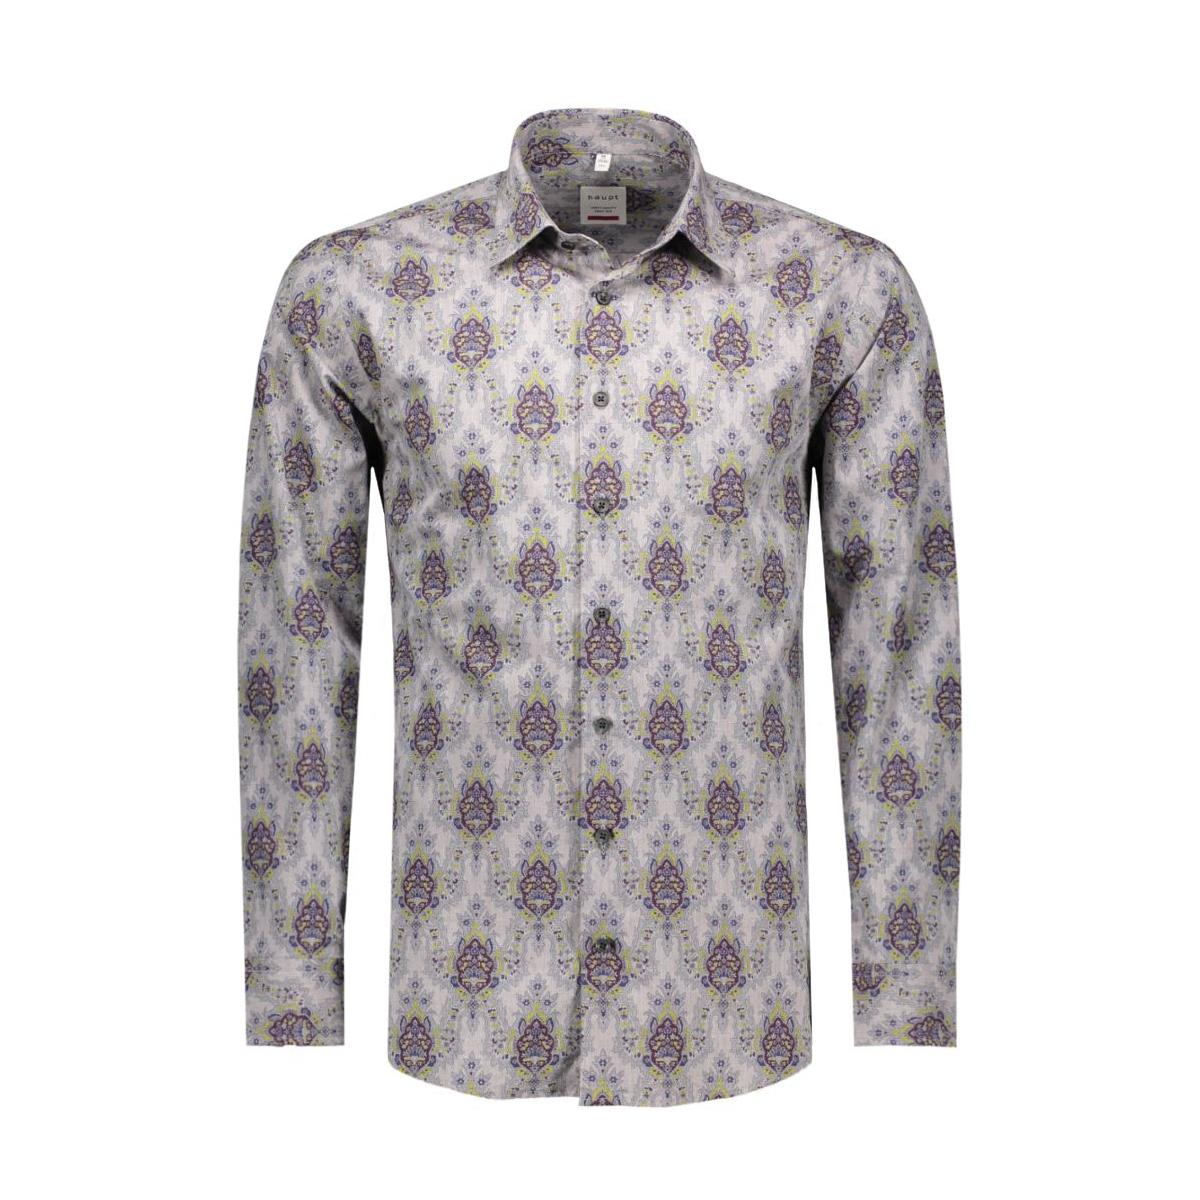 1300 8137 haupt overhemd 01